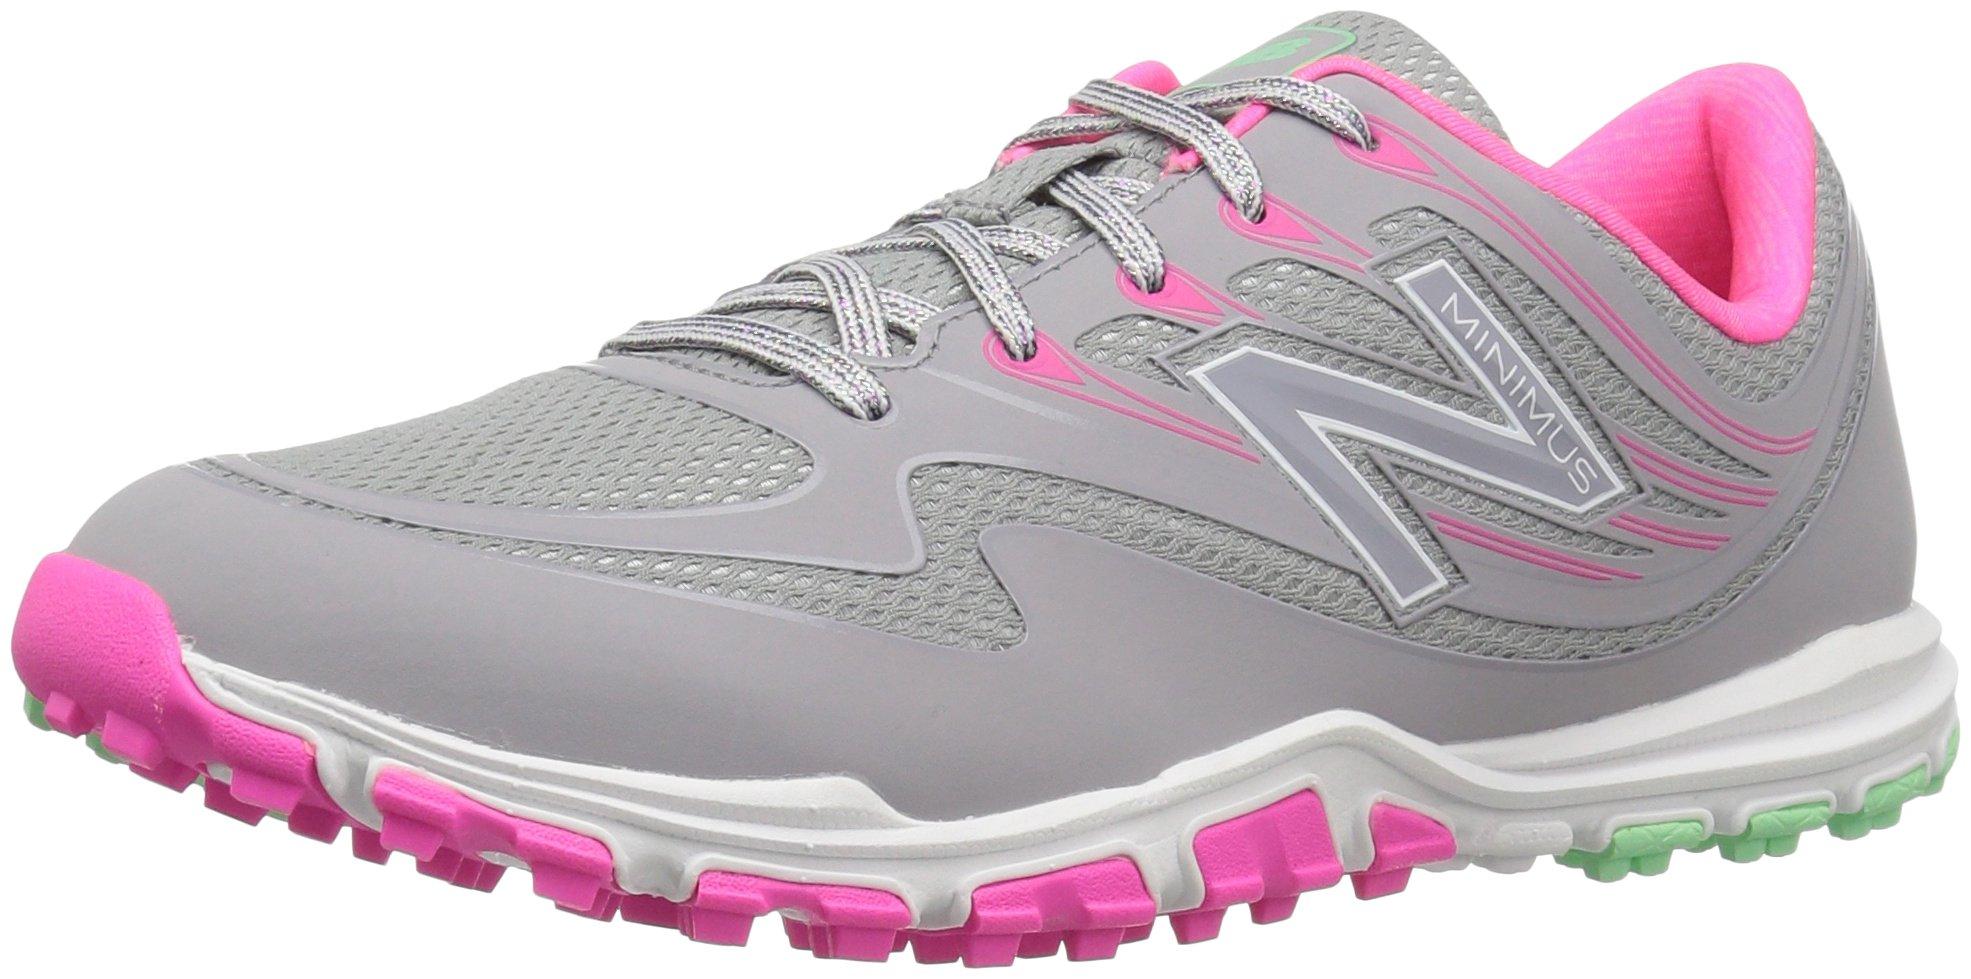 New Balance Women's nbgw1006 Golf Shoe, Grey/Pink, 10 D US